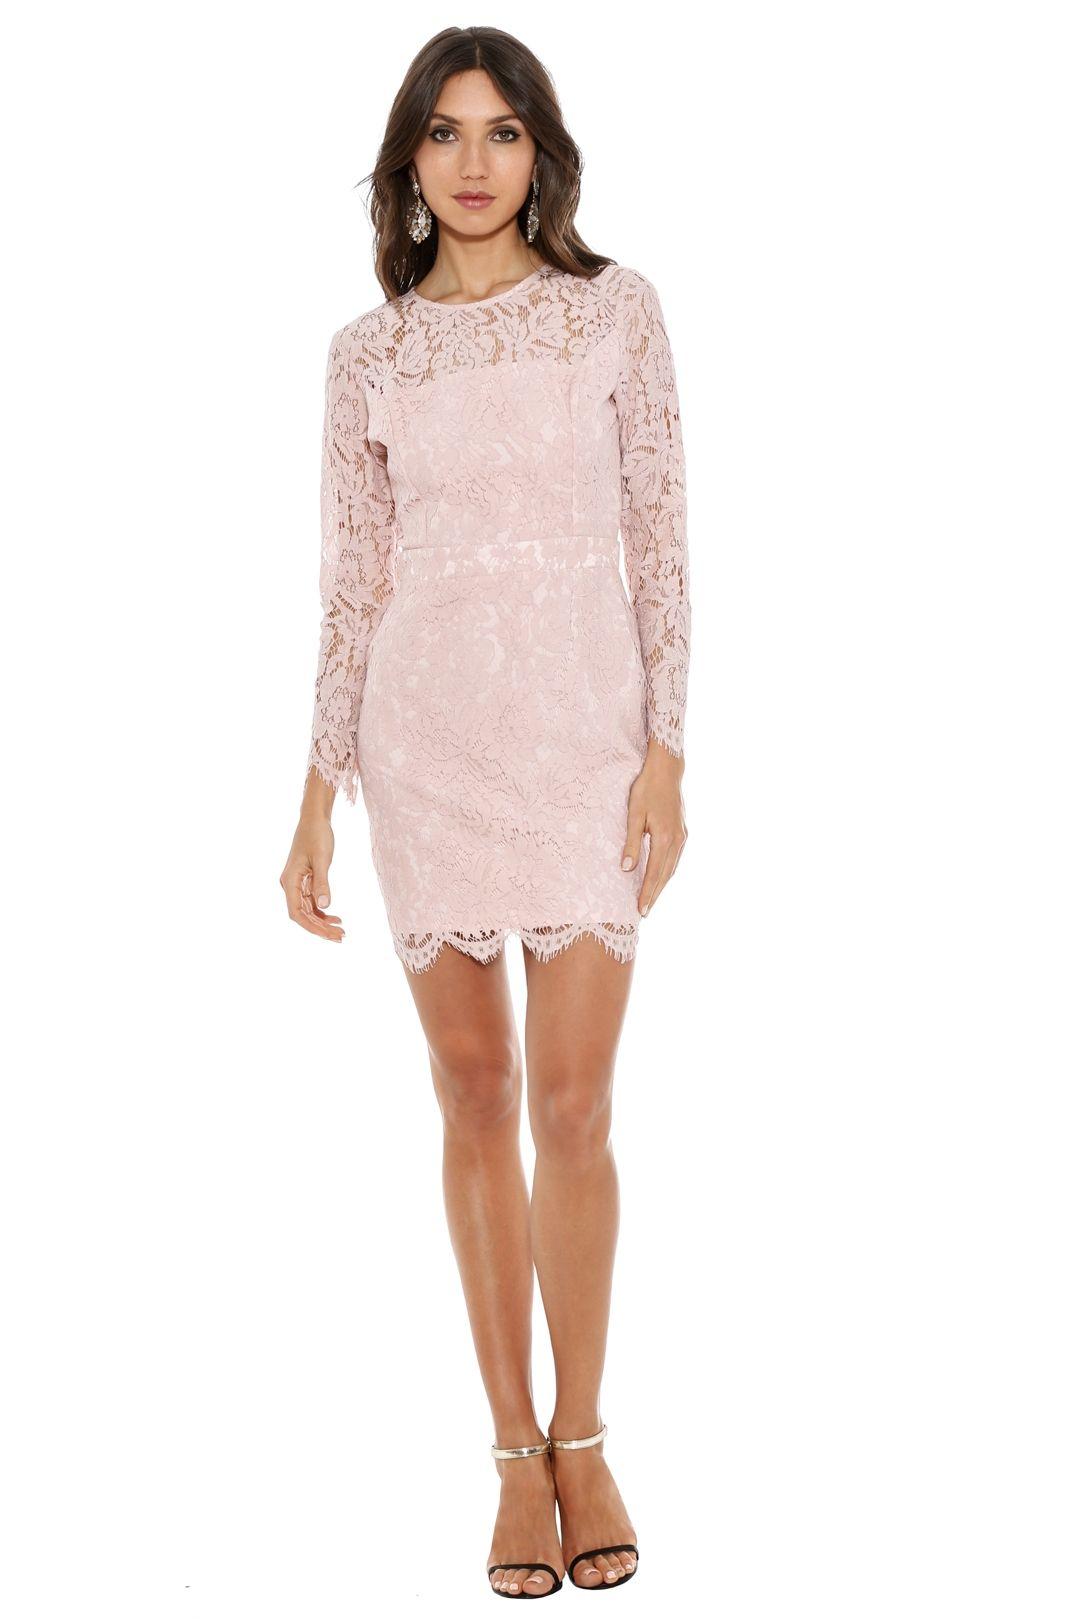 Karla Grimaldi - Carla Lace Mini Dress - Pink - Front